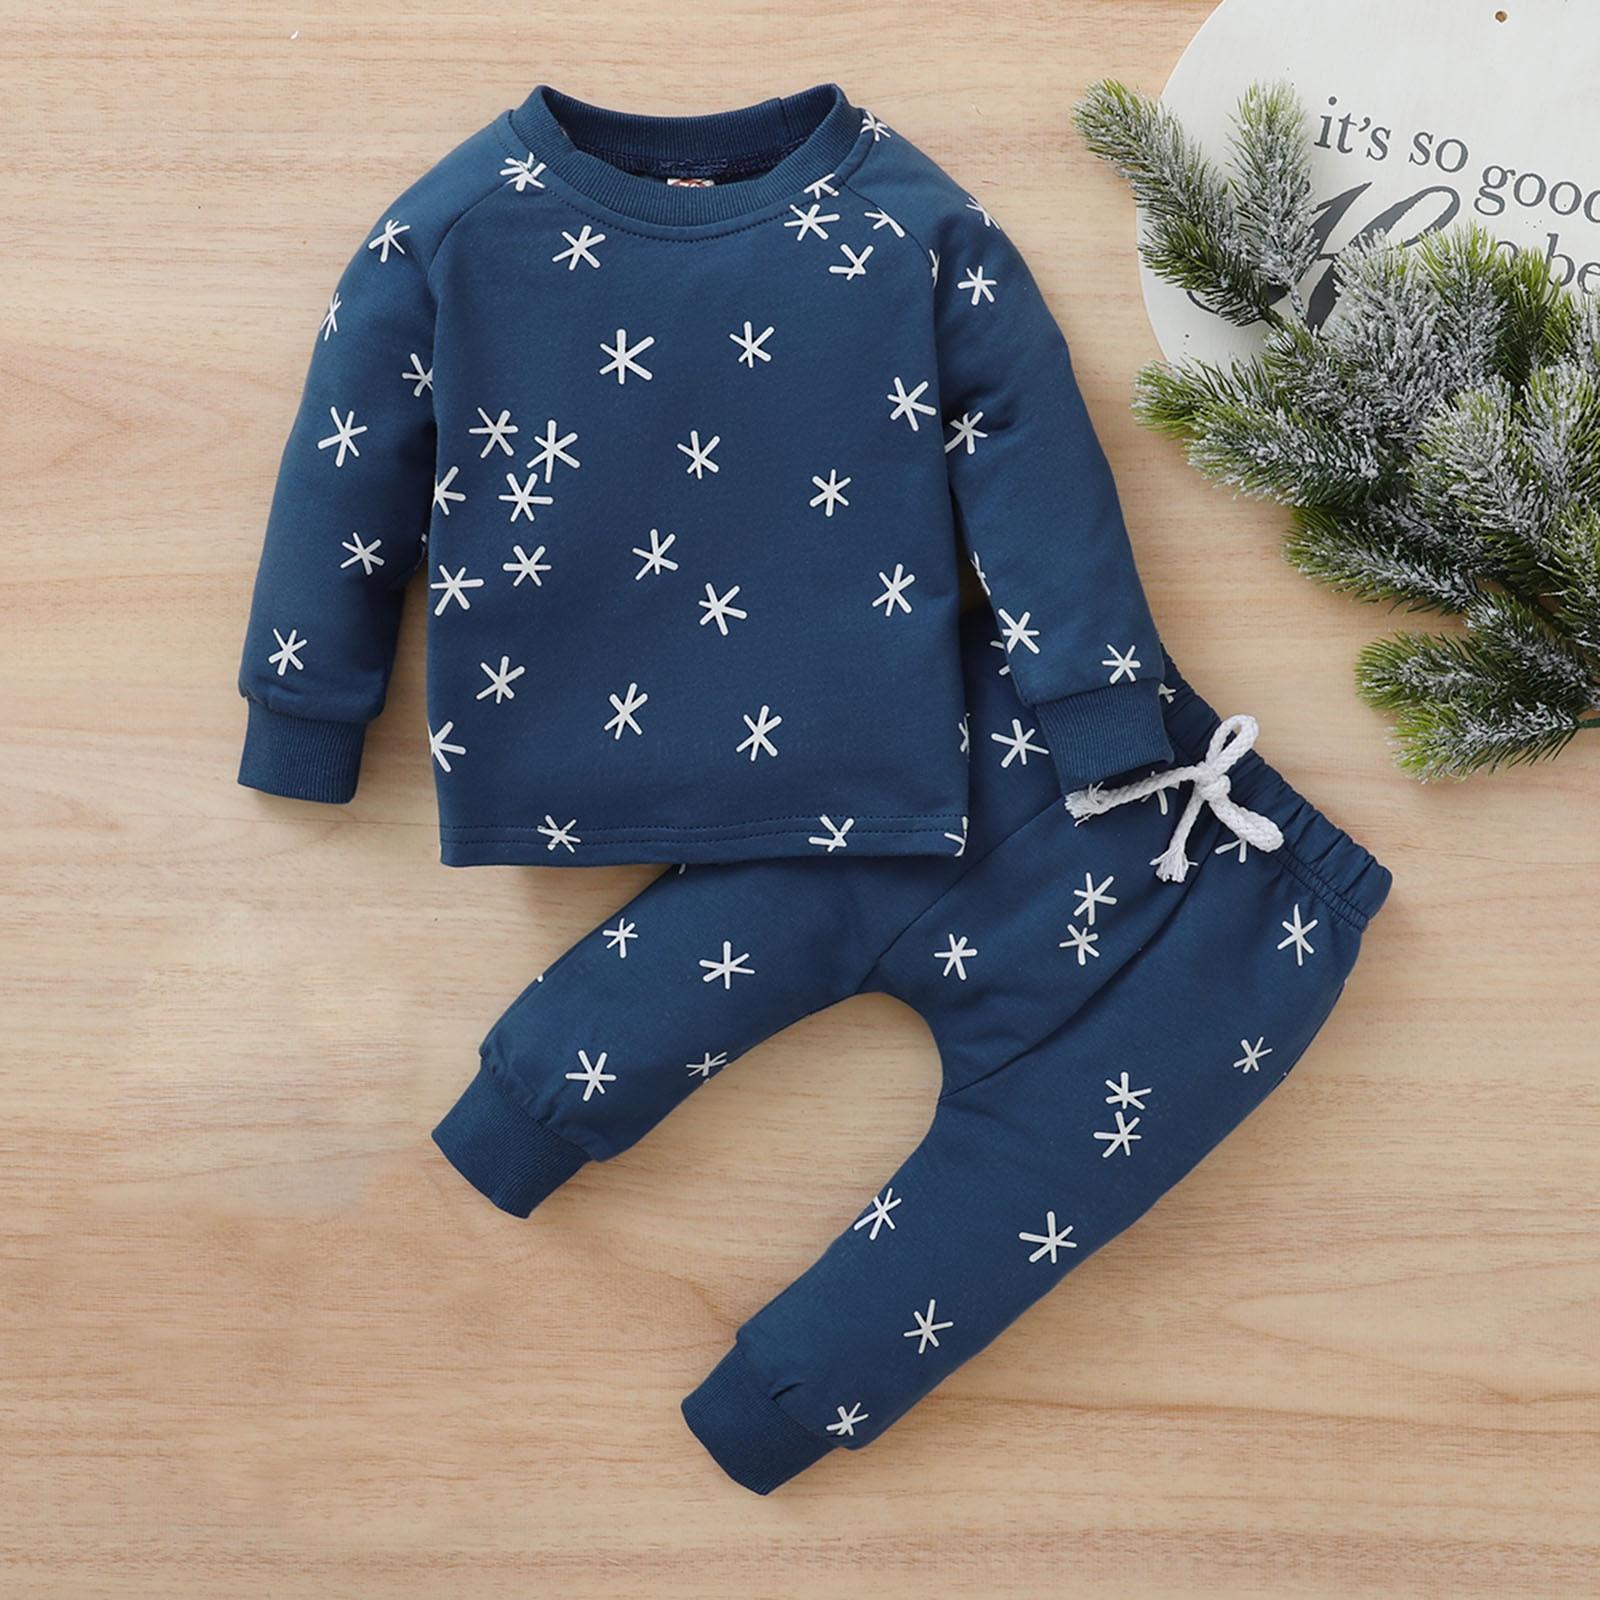 SZYADEOU Home Set Toddler Kids Baby Boys Ang Girls Long Sleeve Print Tops+Start Pants Set For 0-24 Months Костюм младенца